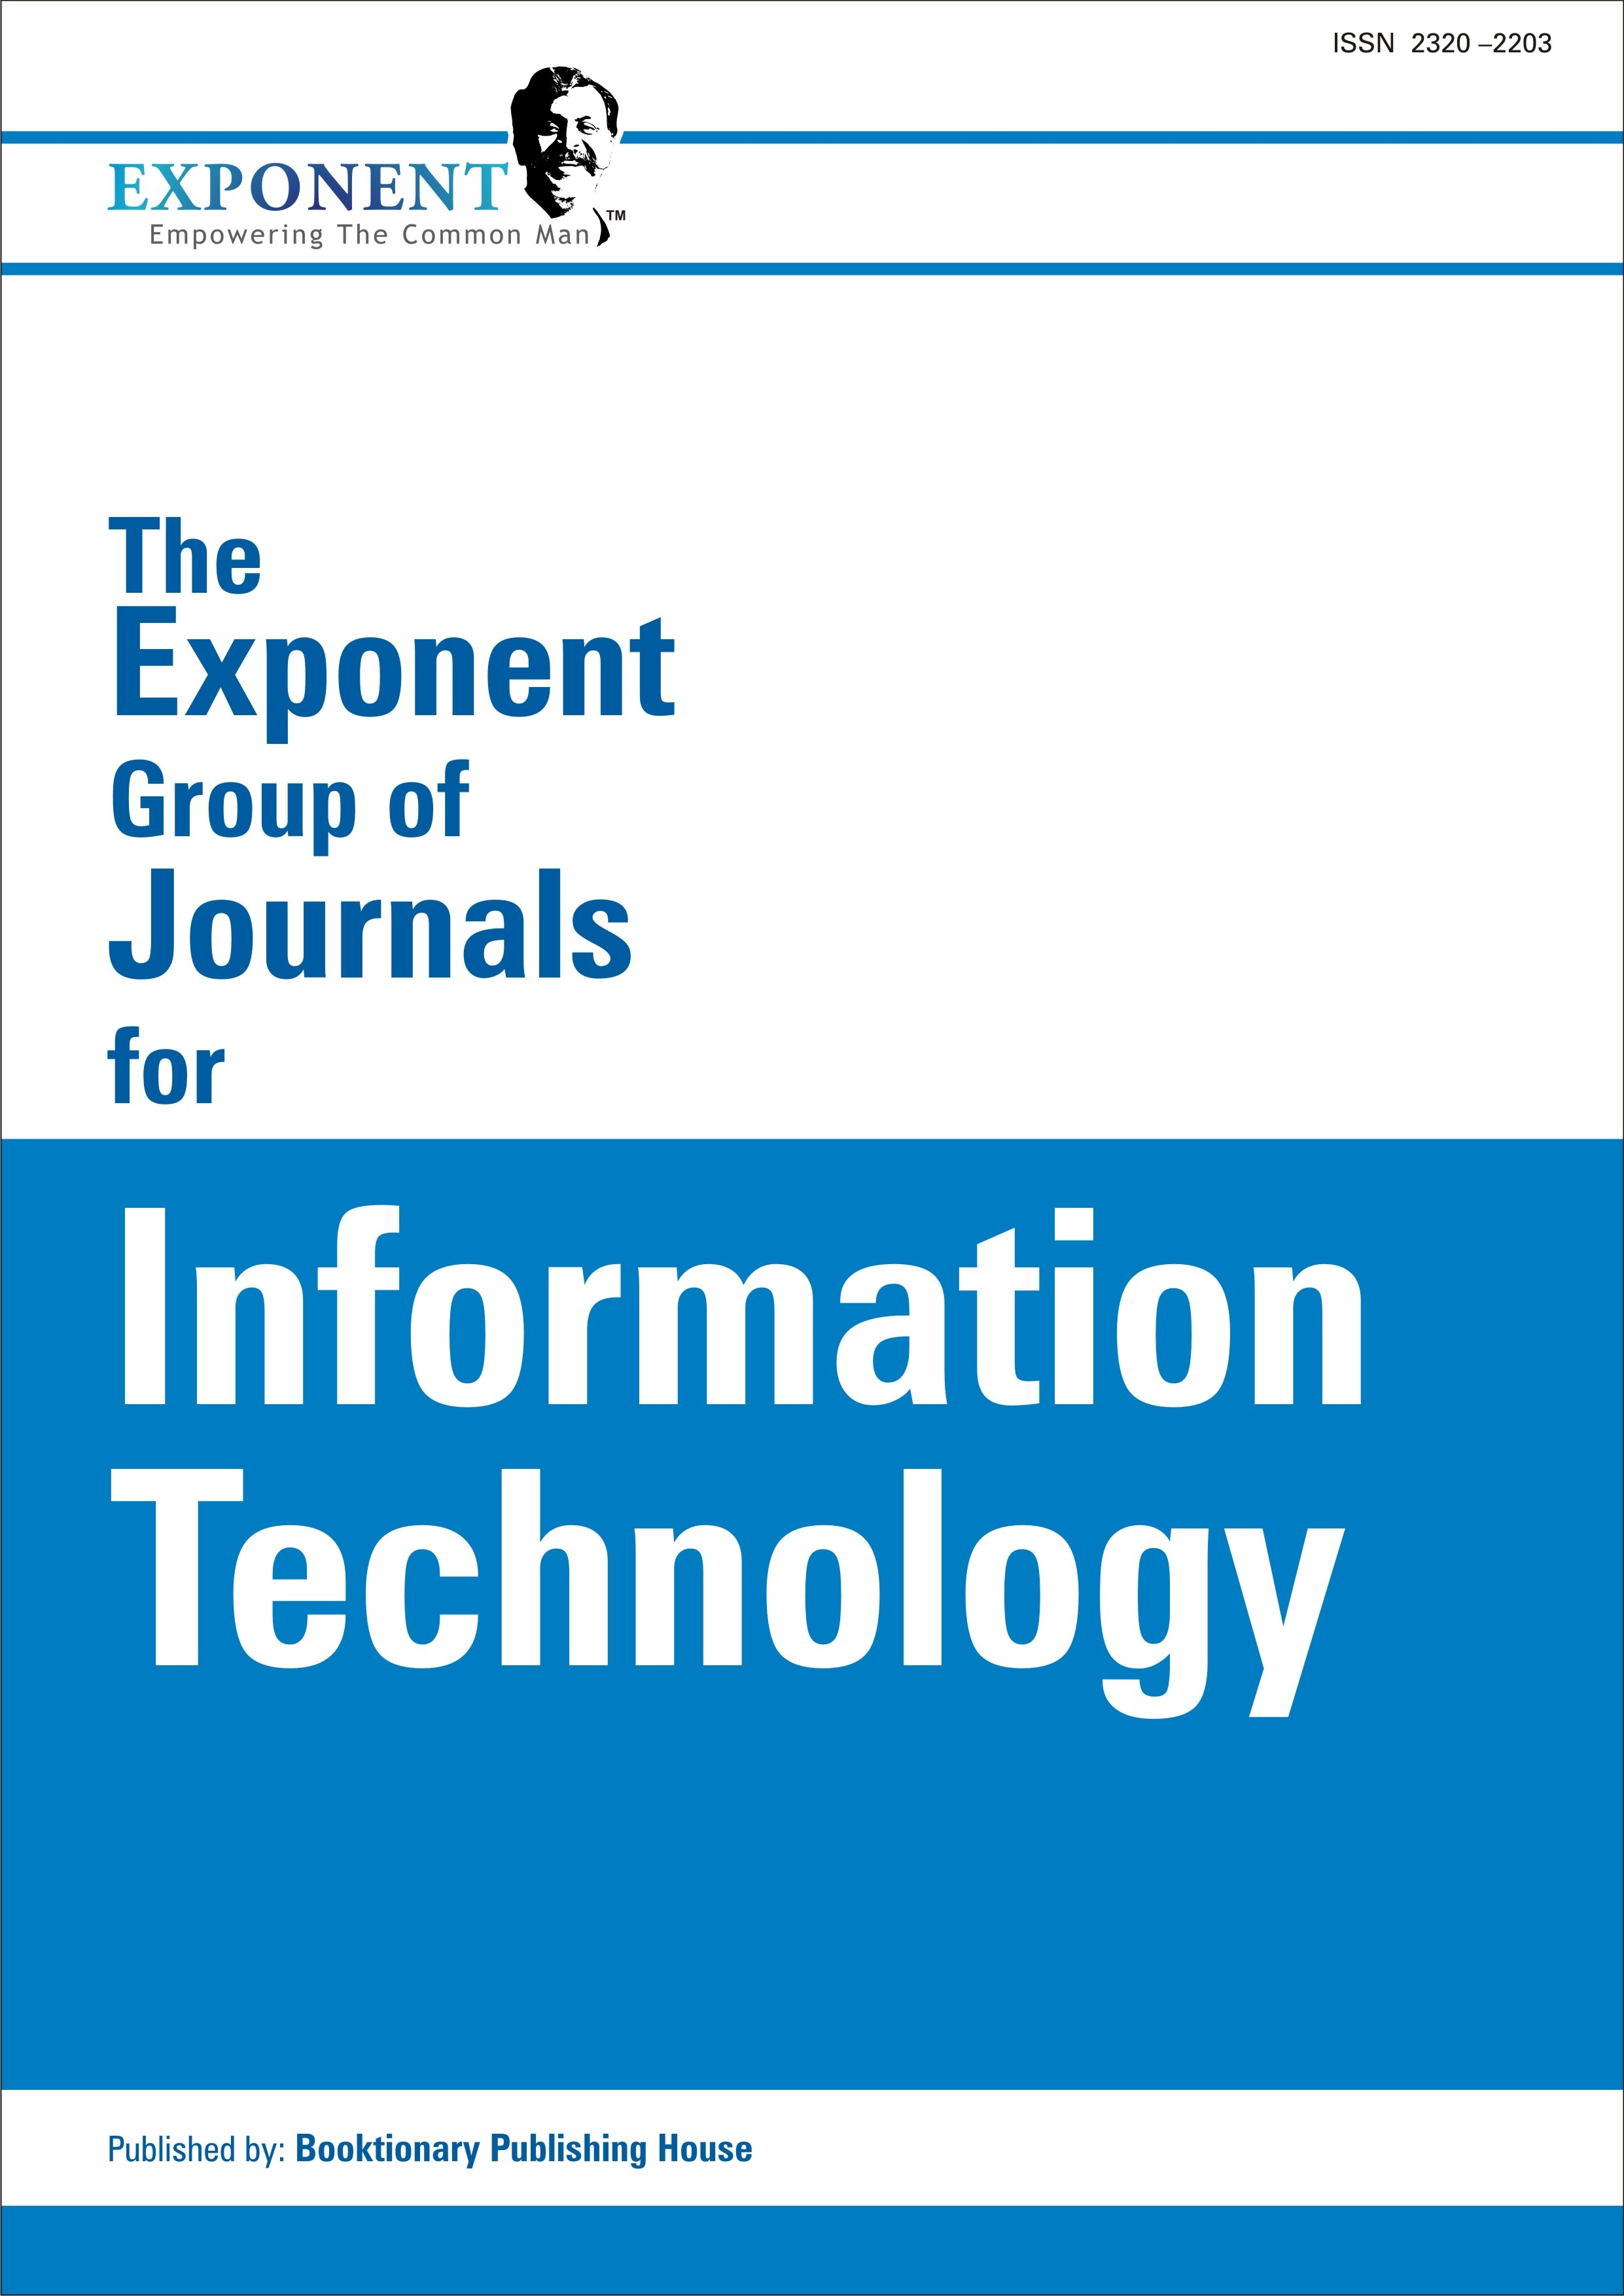 Volume V - Number 4 - IT Journal Cover